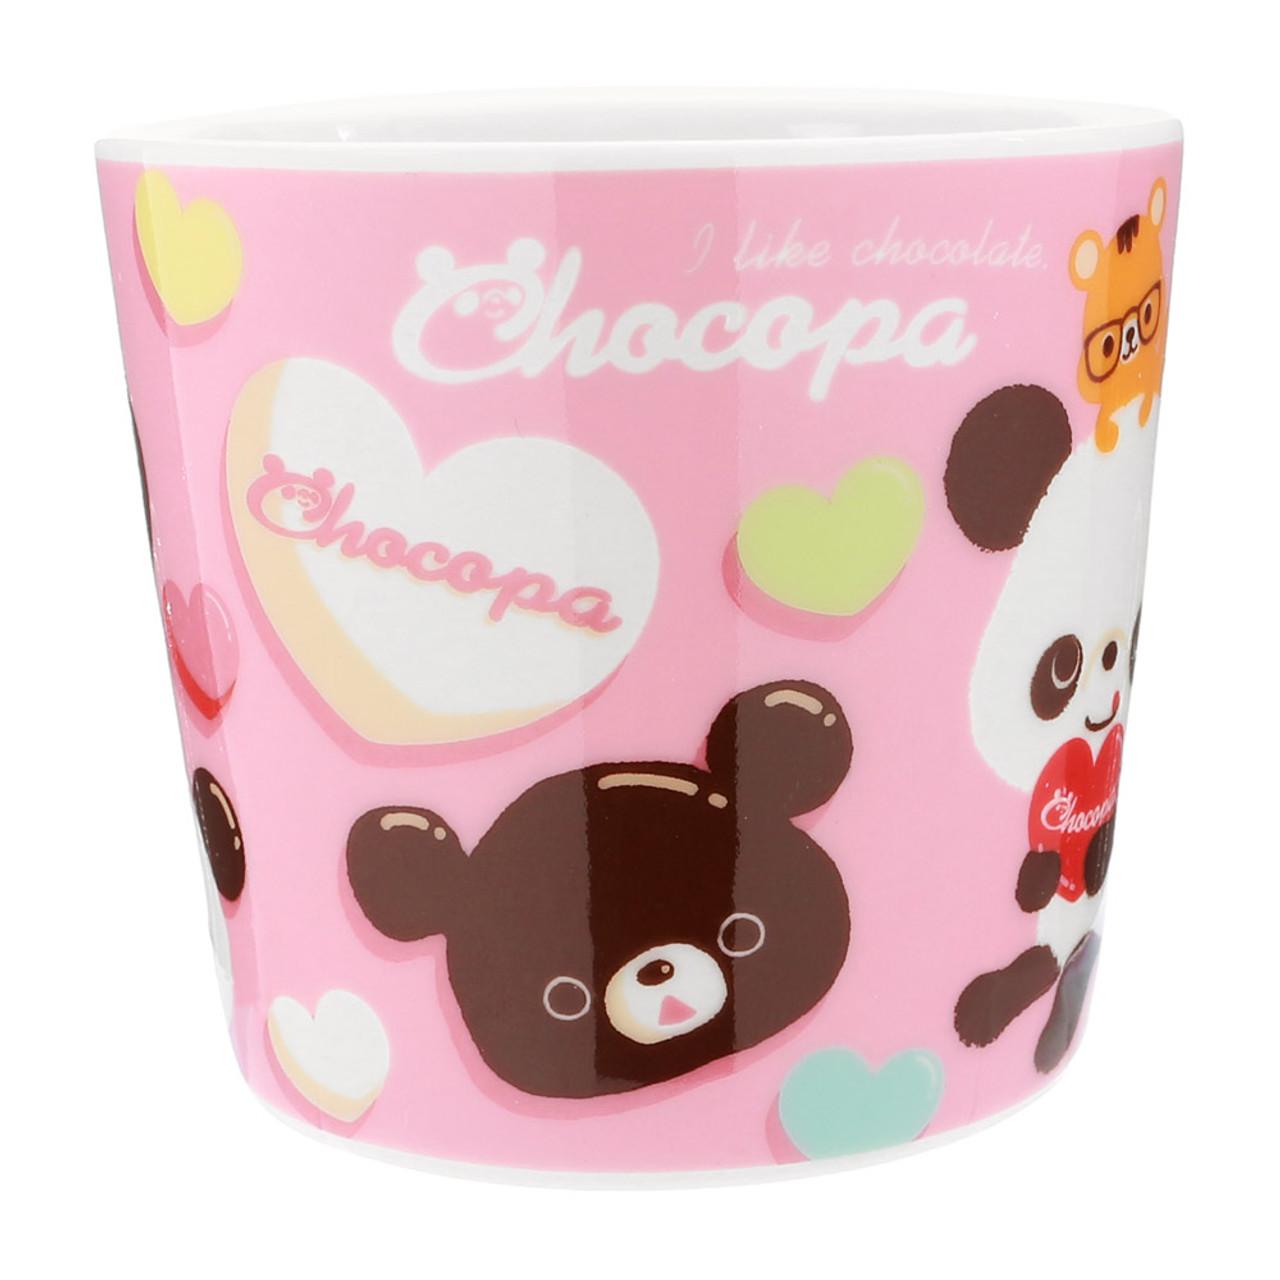 San-x Chocopa Panda Pink Porcelain Cup ( Side View )